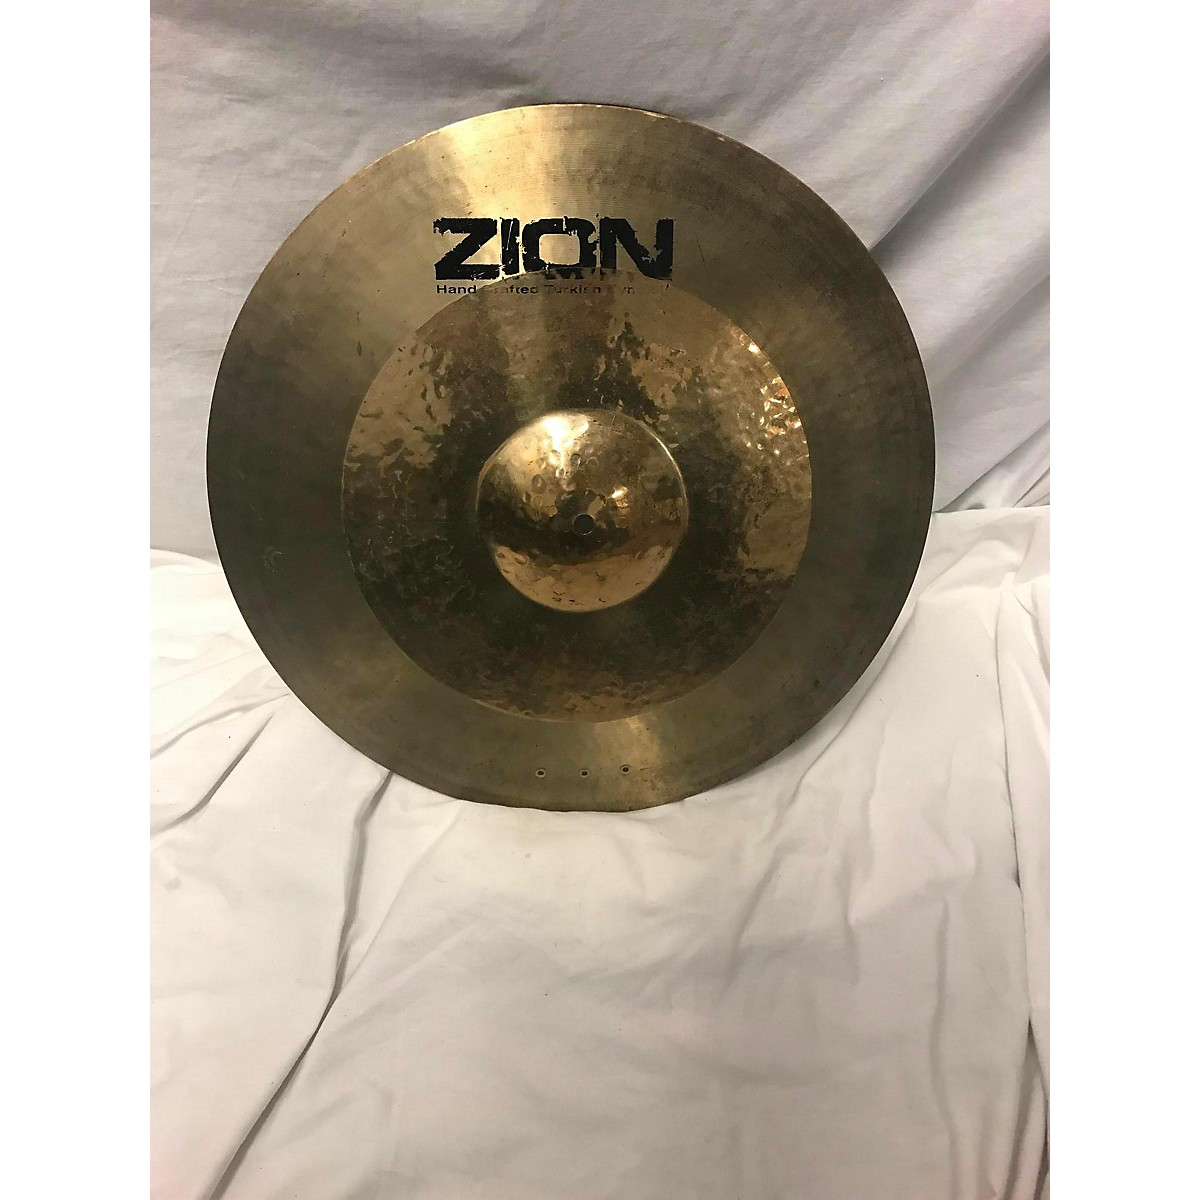 Zion 19in EPIC DARK CRASH Cymbal